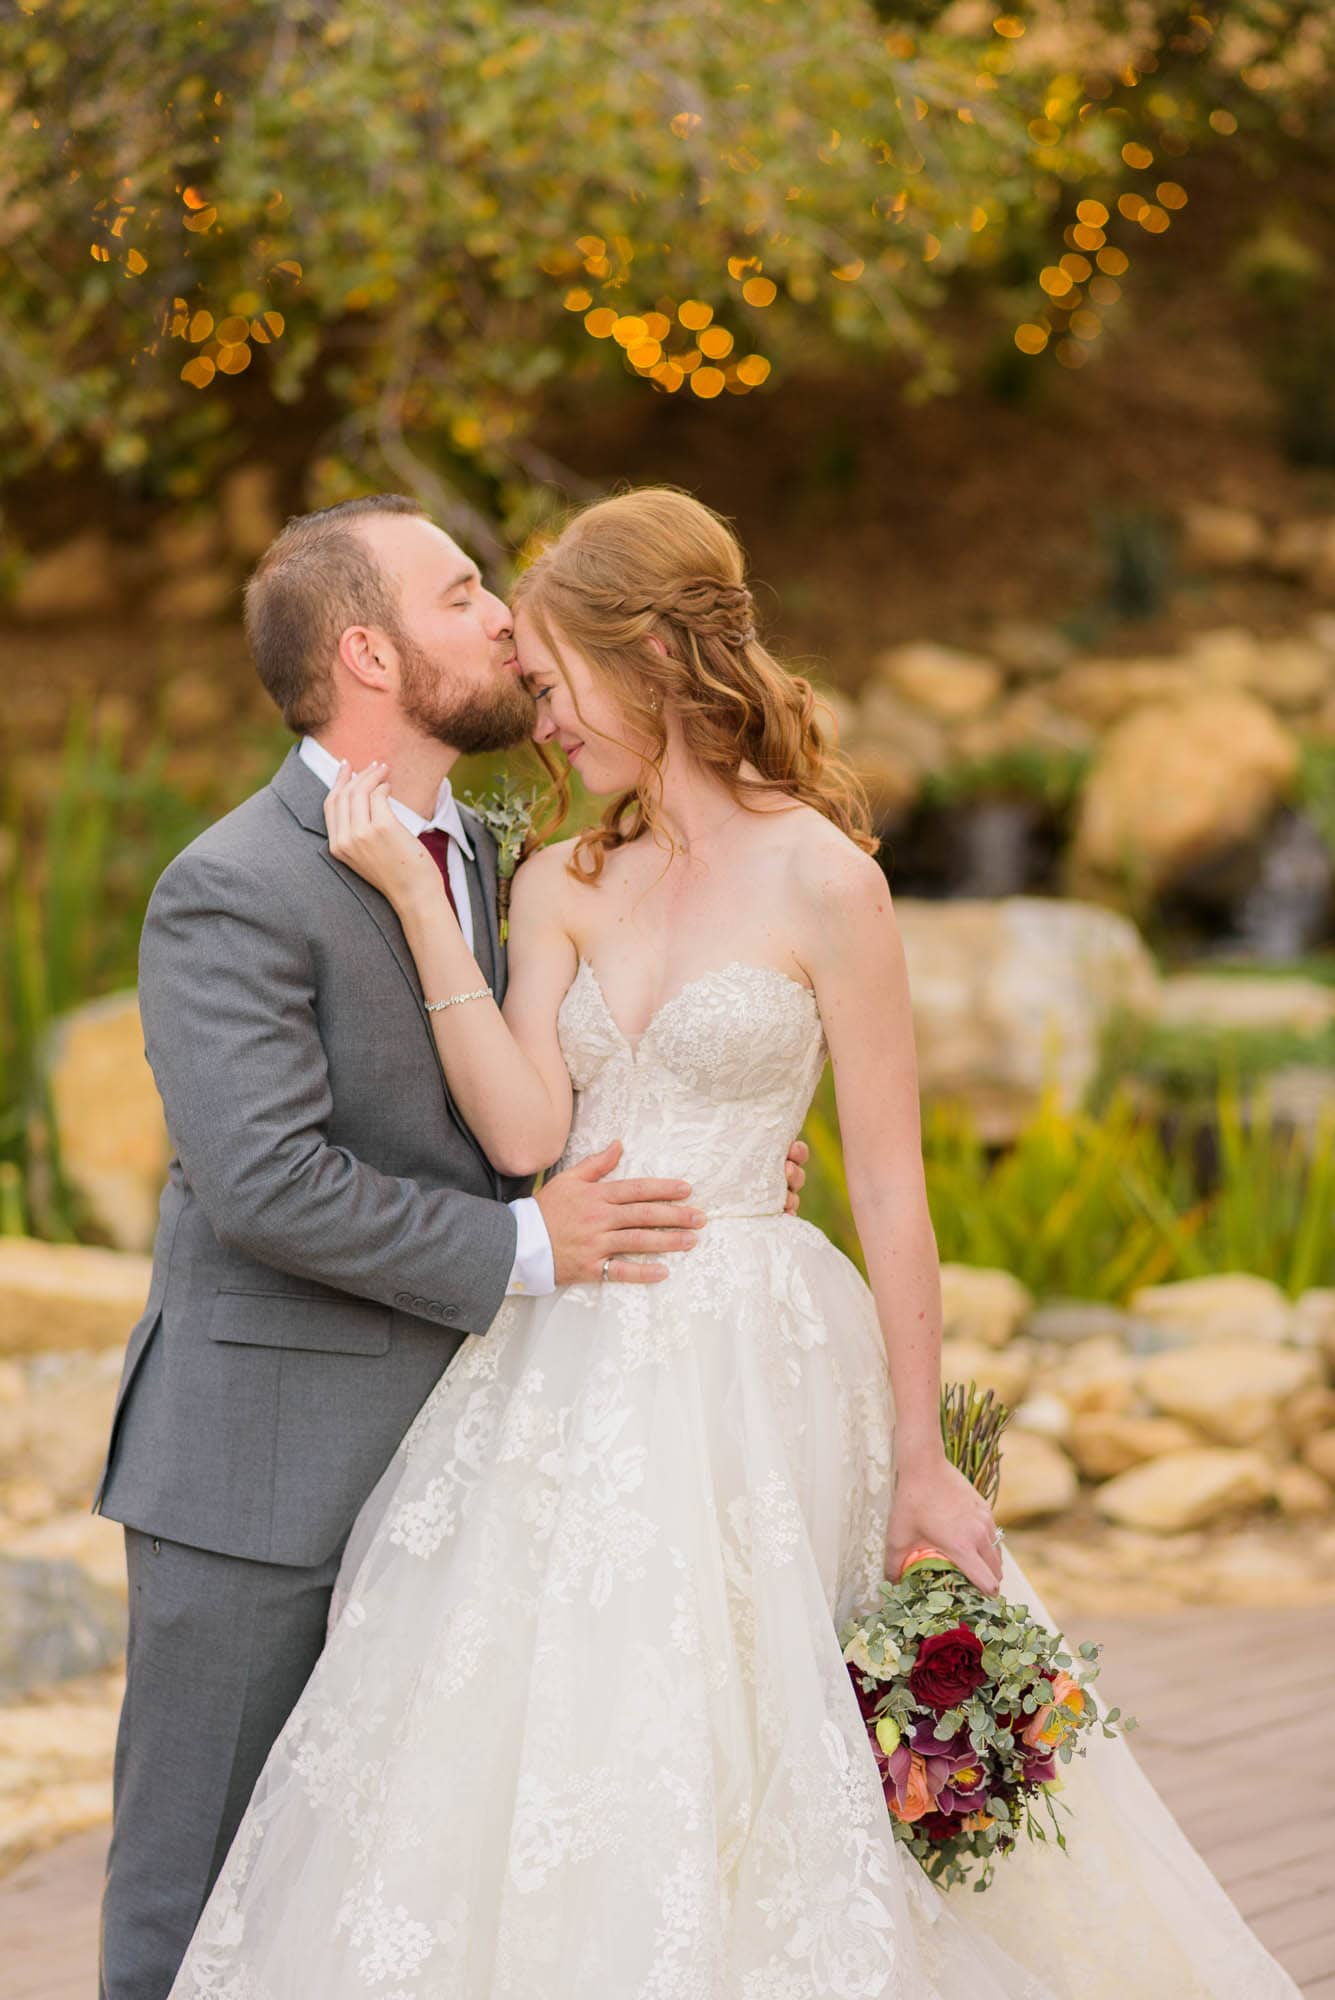 419_Alan_and_Heidi_Serendipity_Garden_Wedding_10-27-2018